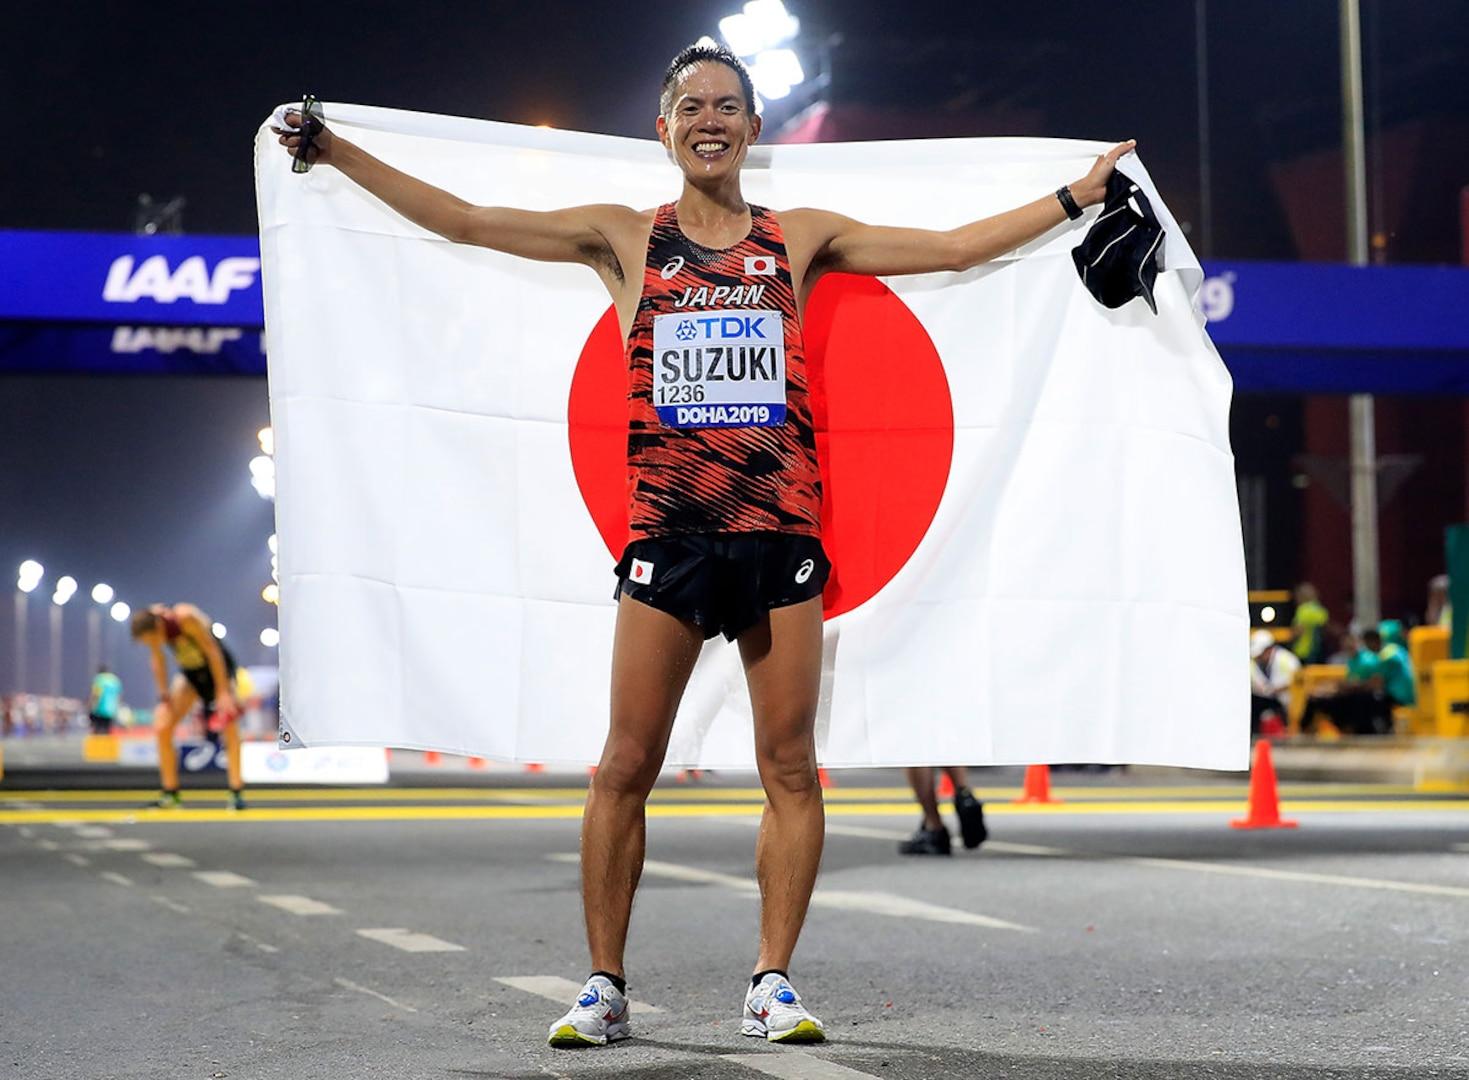 Yusuke Suzuki celebrates with the Japanese flag after winning a world title